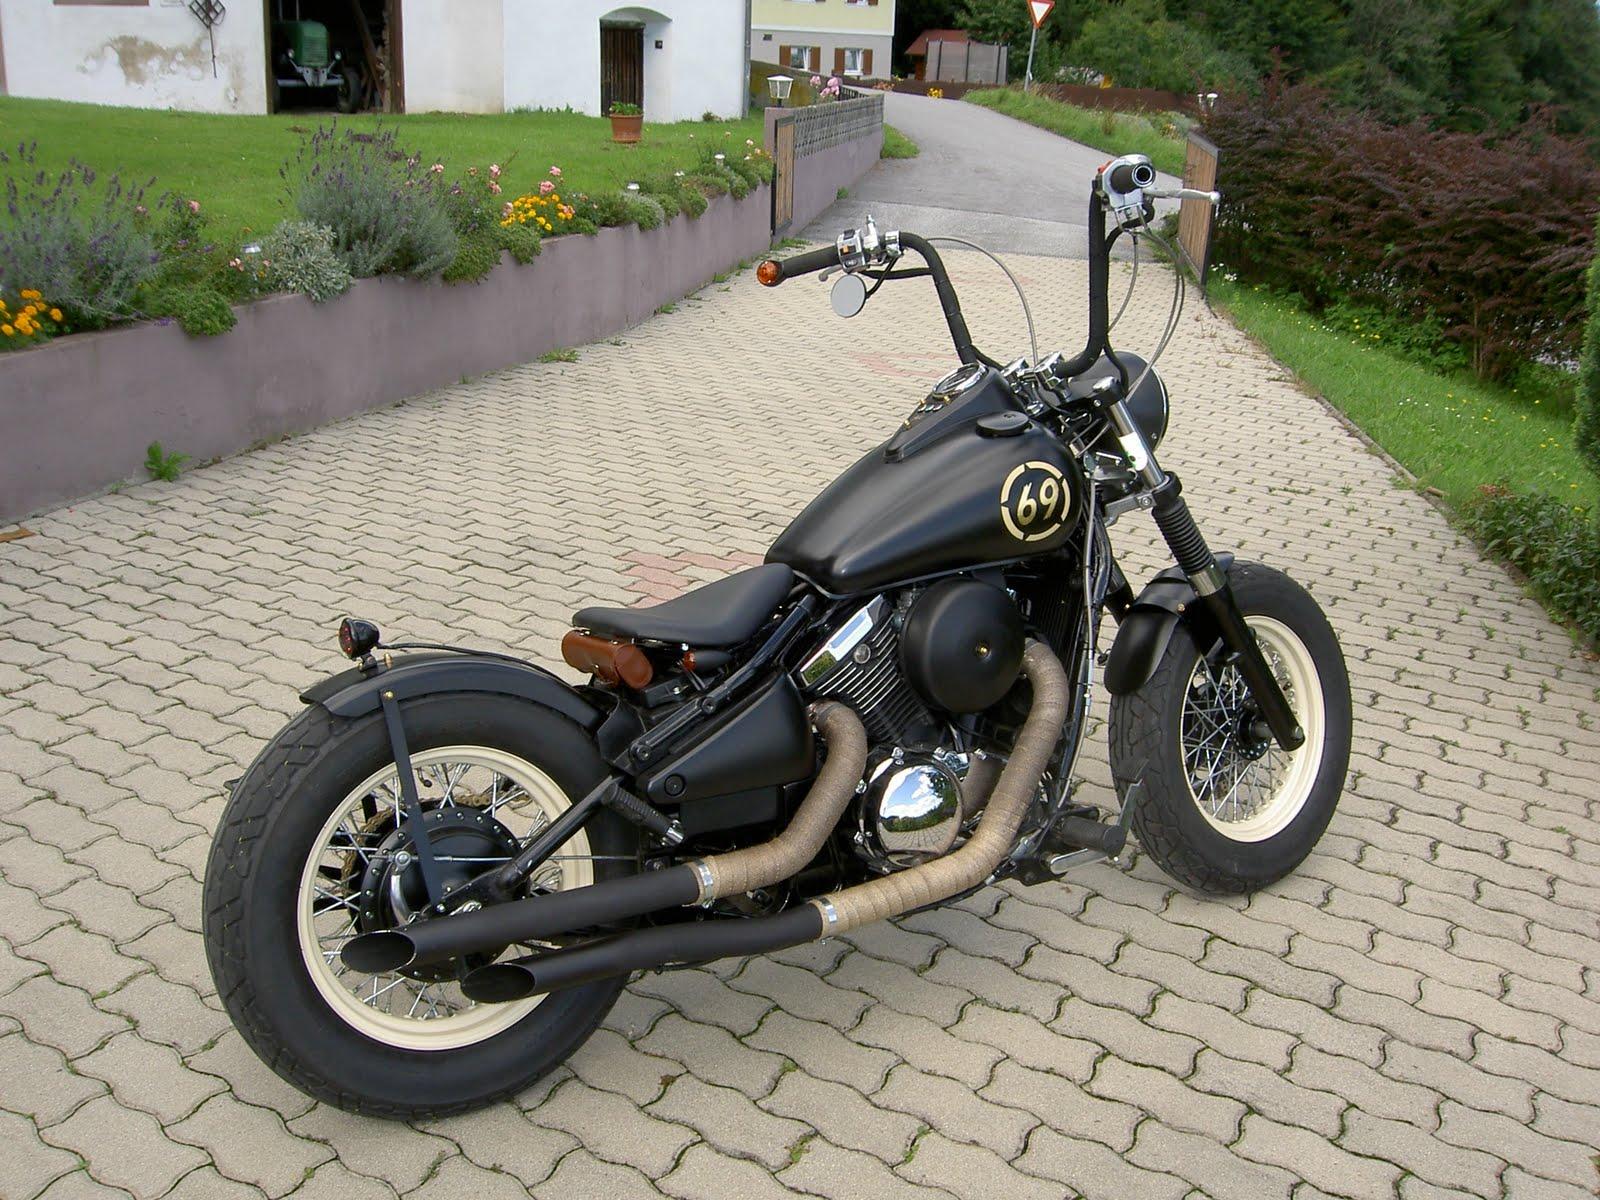 energy news kawasaki vn 800 vulcan bobber motorcycle fr. Black Bedroom Furniture Sets. Home Design Ideas